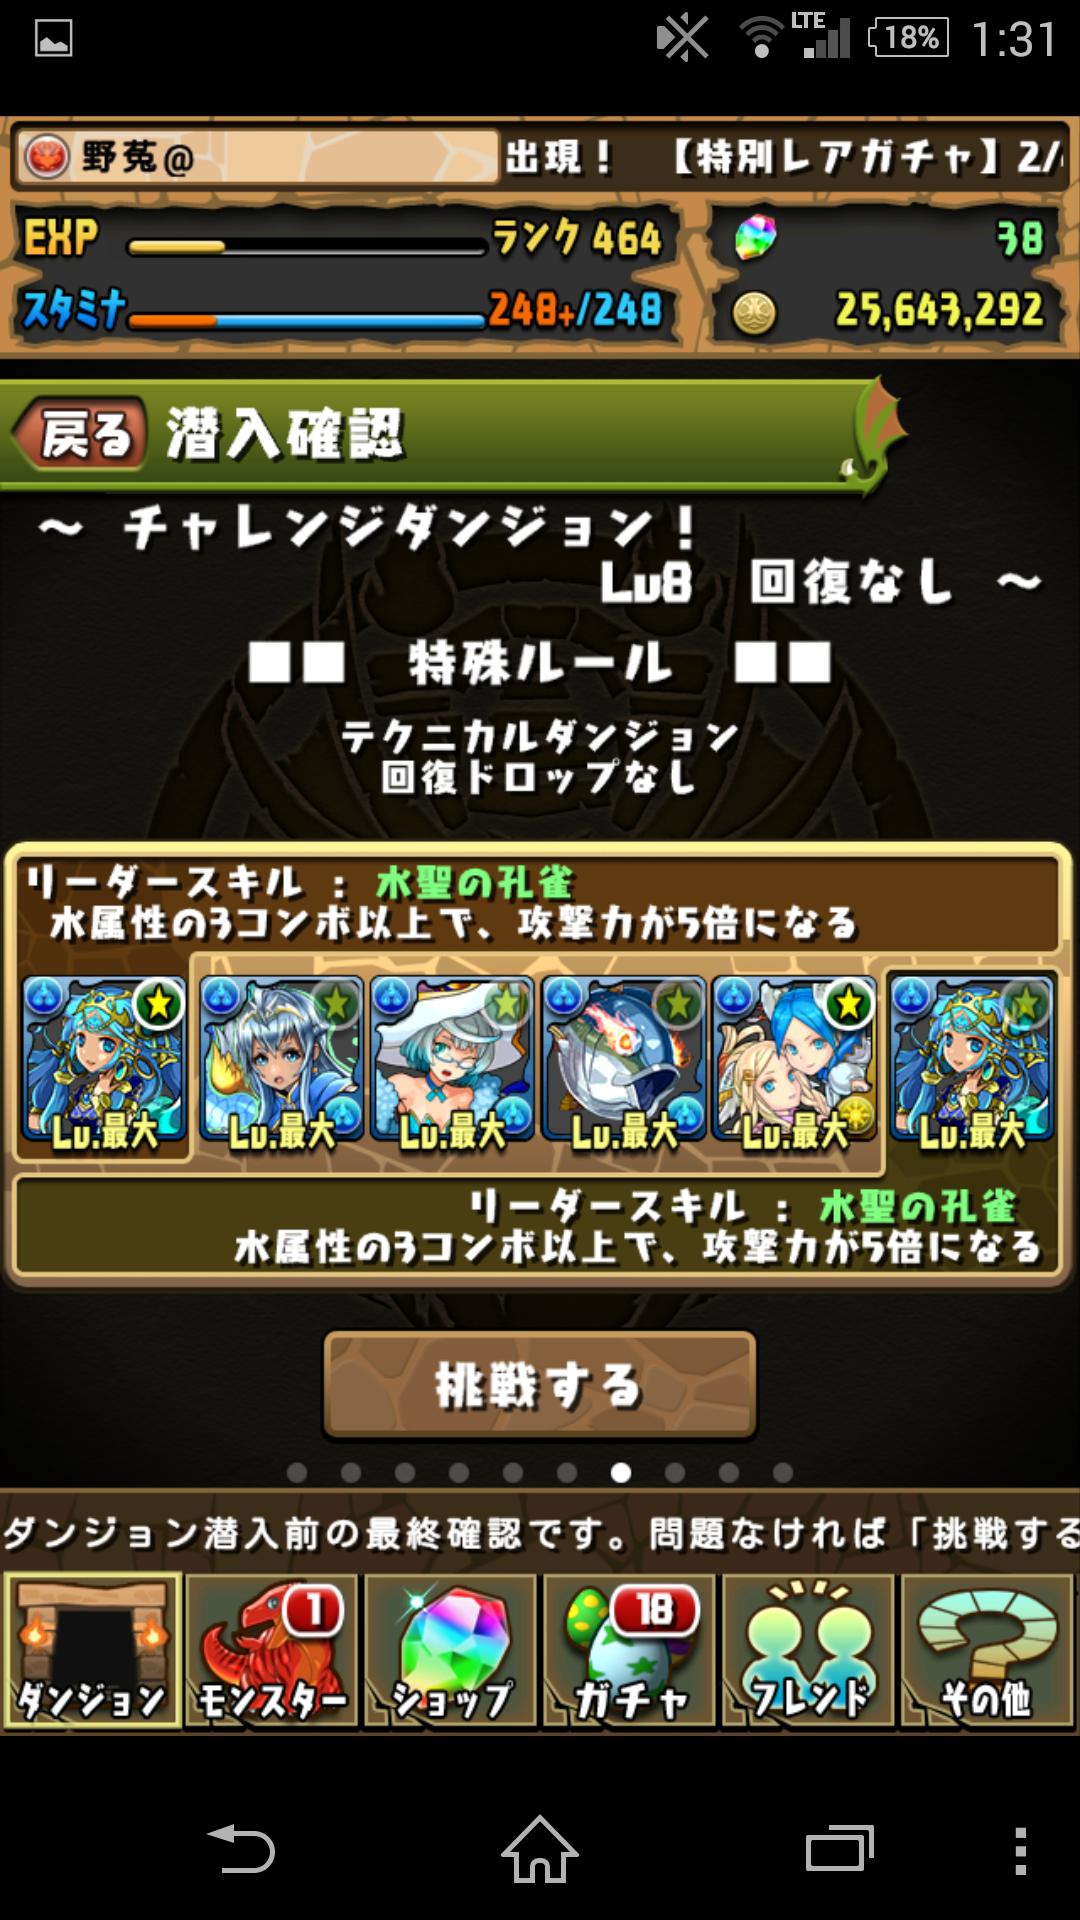 Screenshot_2015-02-12-01-31-33.png